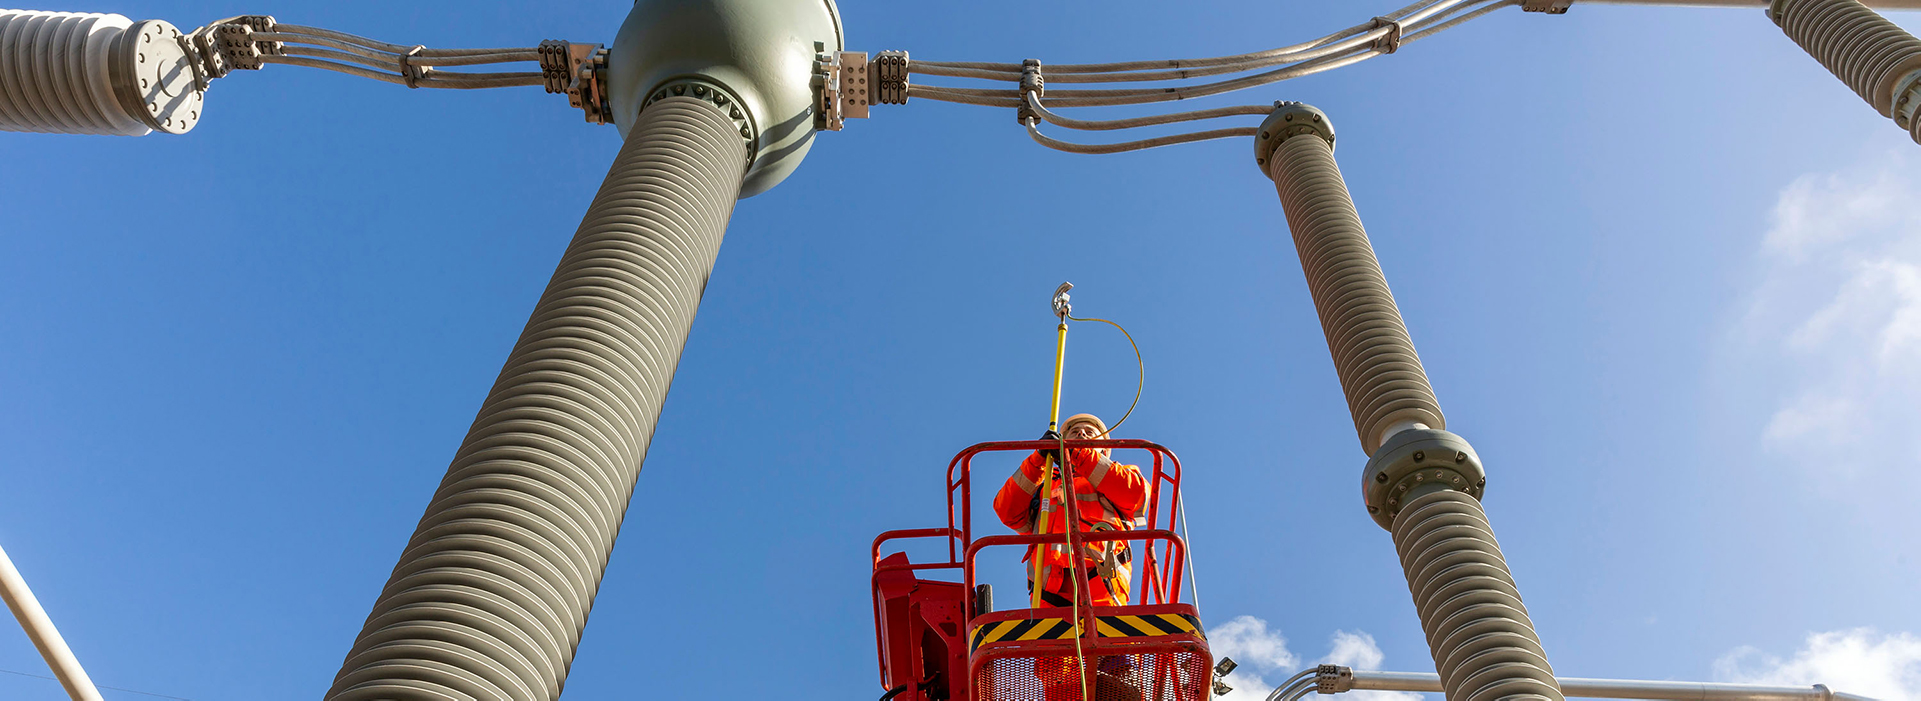 volker energy solutions hoogspanning